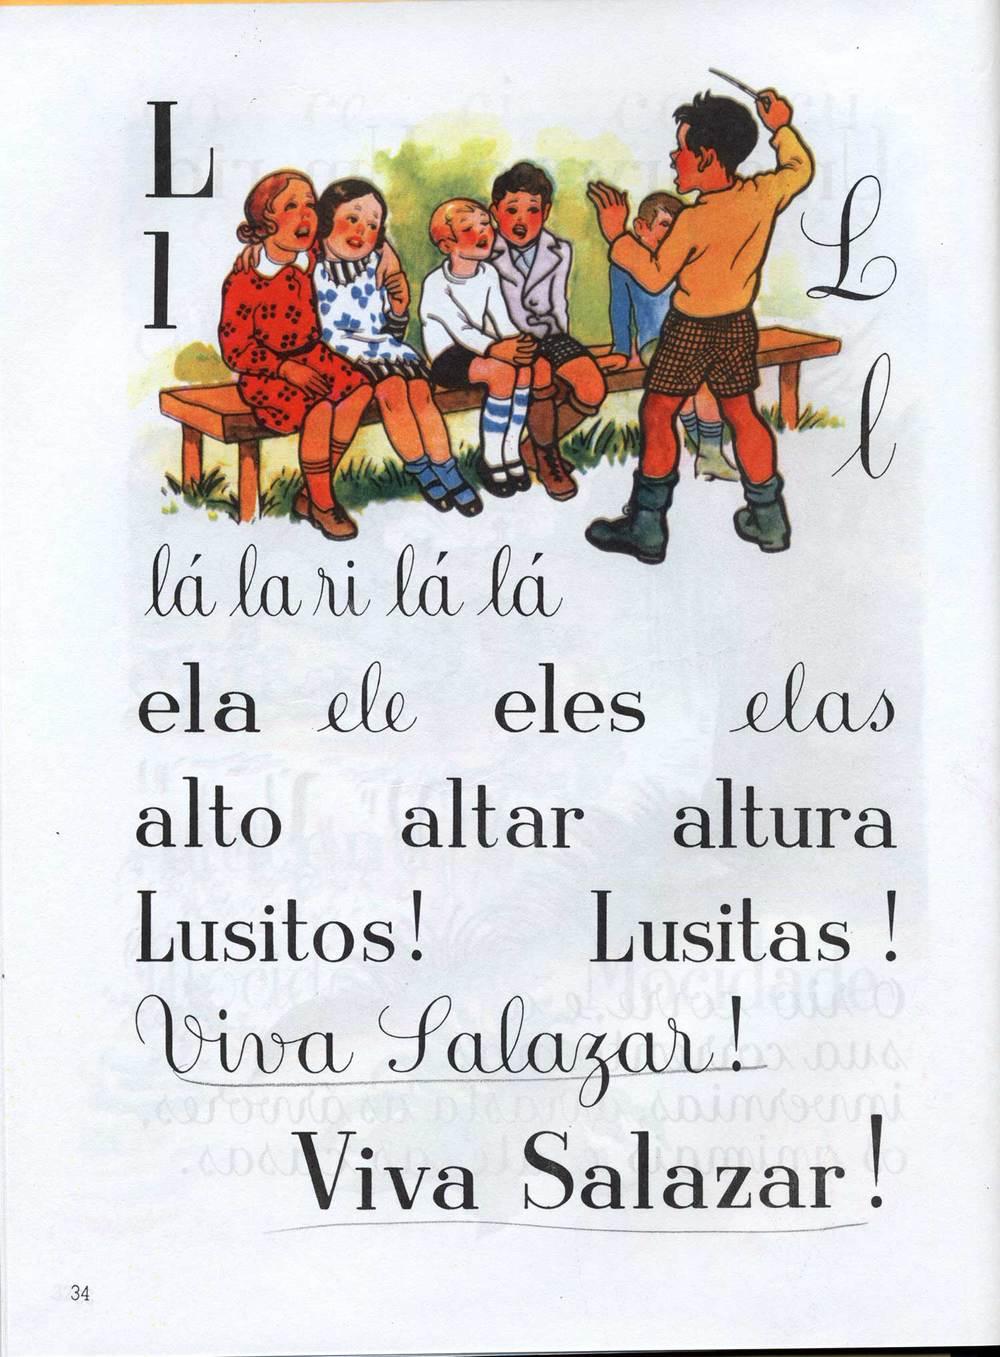 ...ela ele eles elas, alto altar altura, Lusitos! Lusitas! Viva Salazar! Viva Salazar!  (she him they them, high altar high, Lusitos! Lusitas! Viva Salazar! Viva Salazar!)